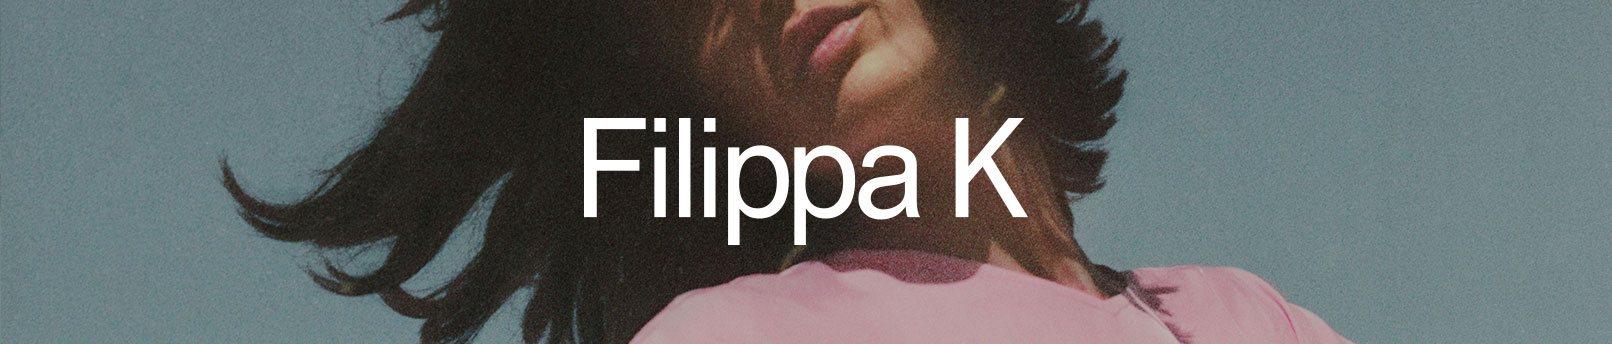 Shop Filippa K